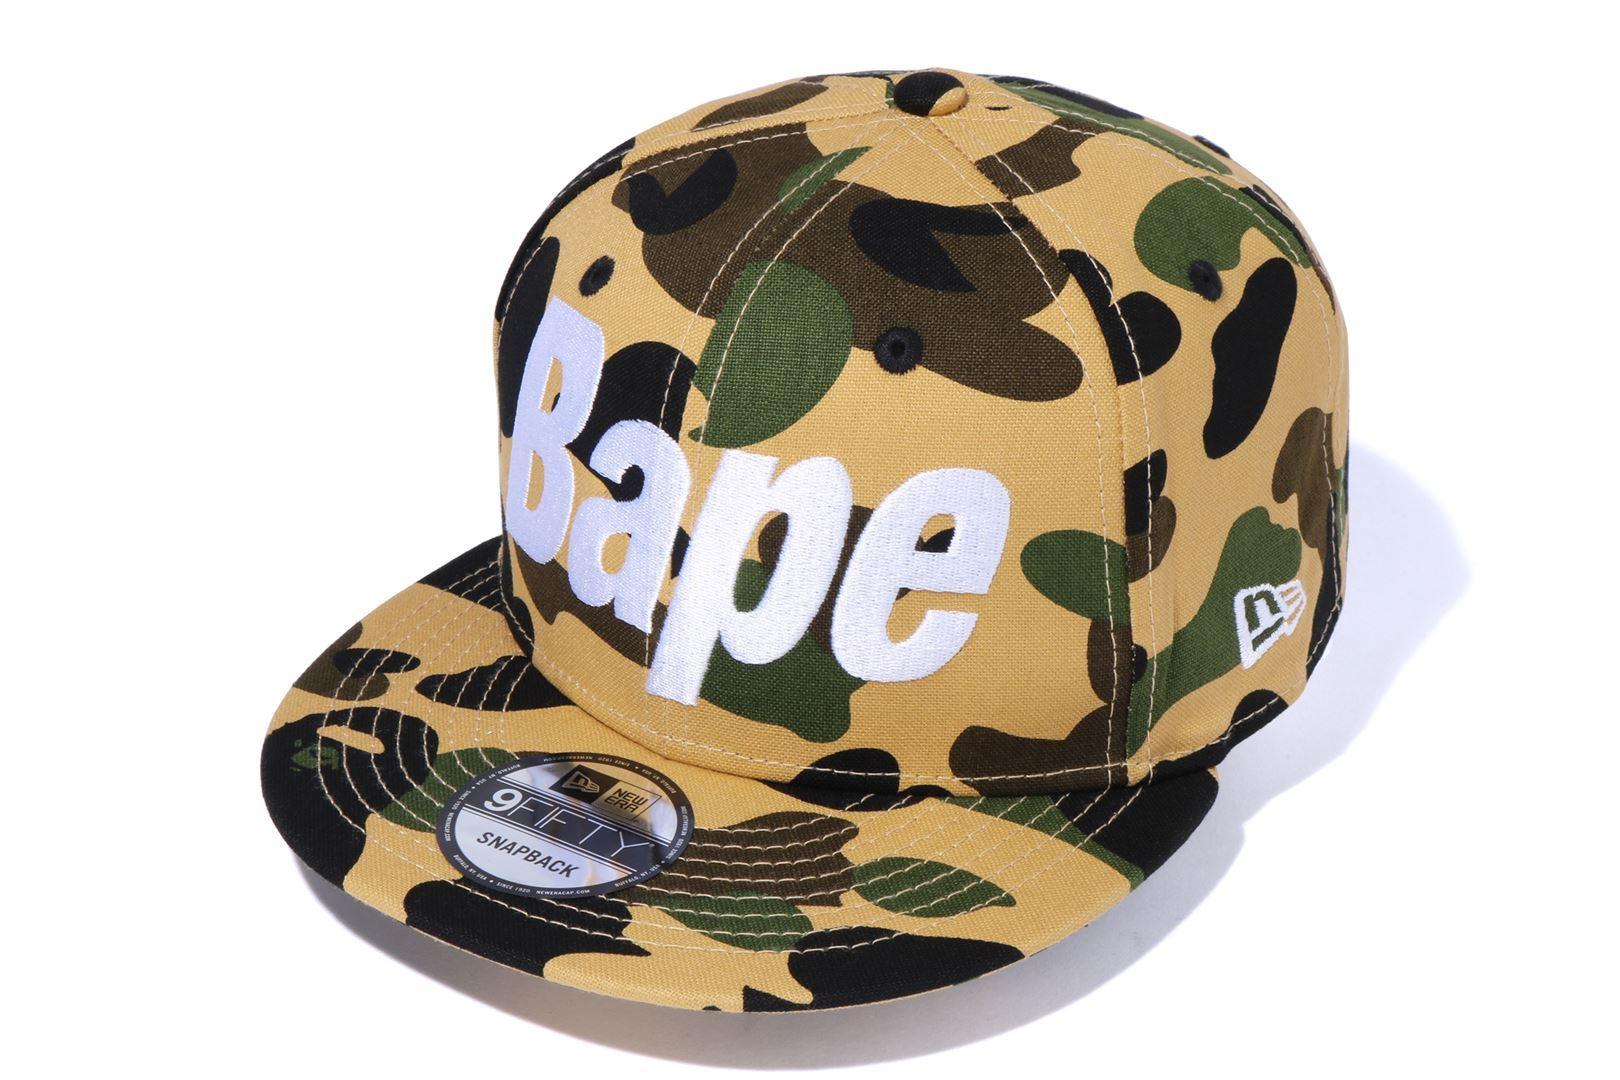 1ST CAMO BAPE NEW ERA SNAP BACK CAP_a0174495_17594654.jpg